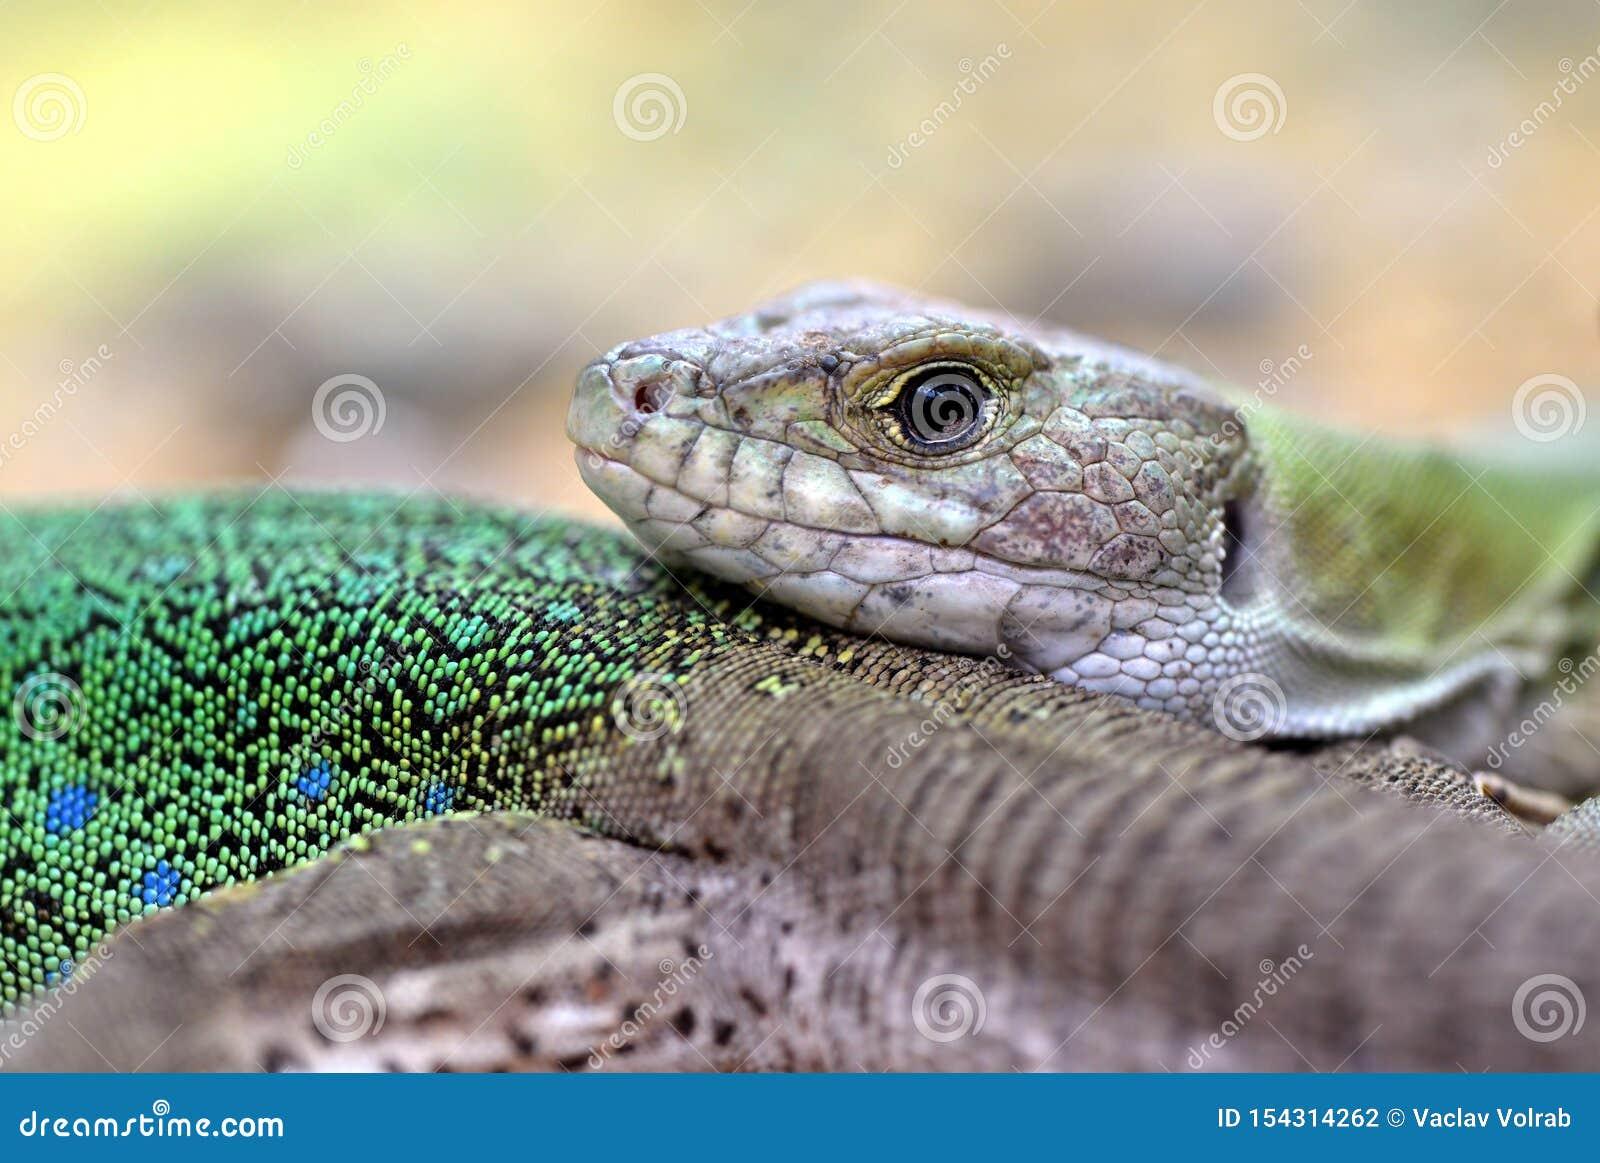 Marokkaanse eyed hagedis - Timon-tangitanus Hagedis in de familie Lacertidae